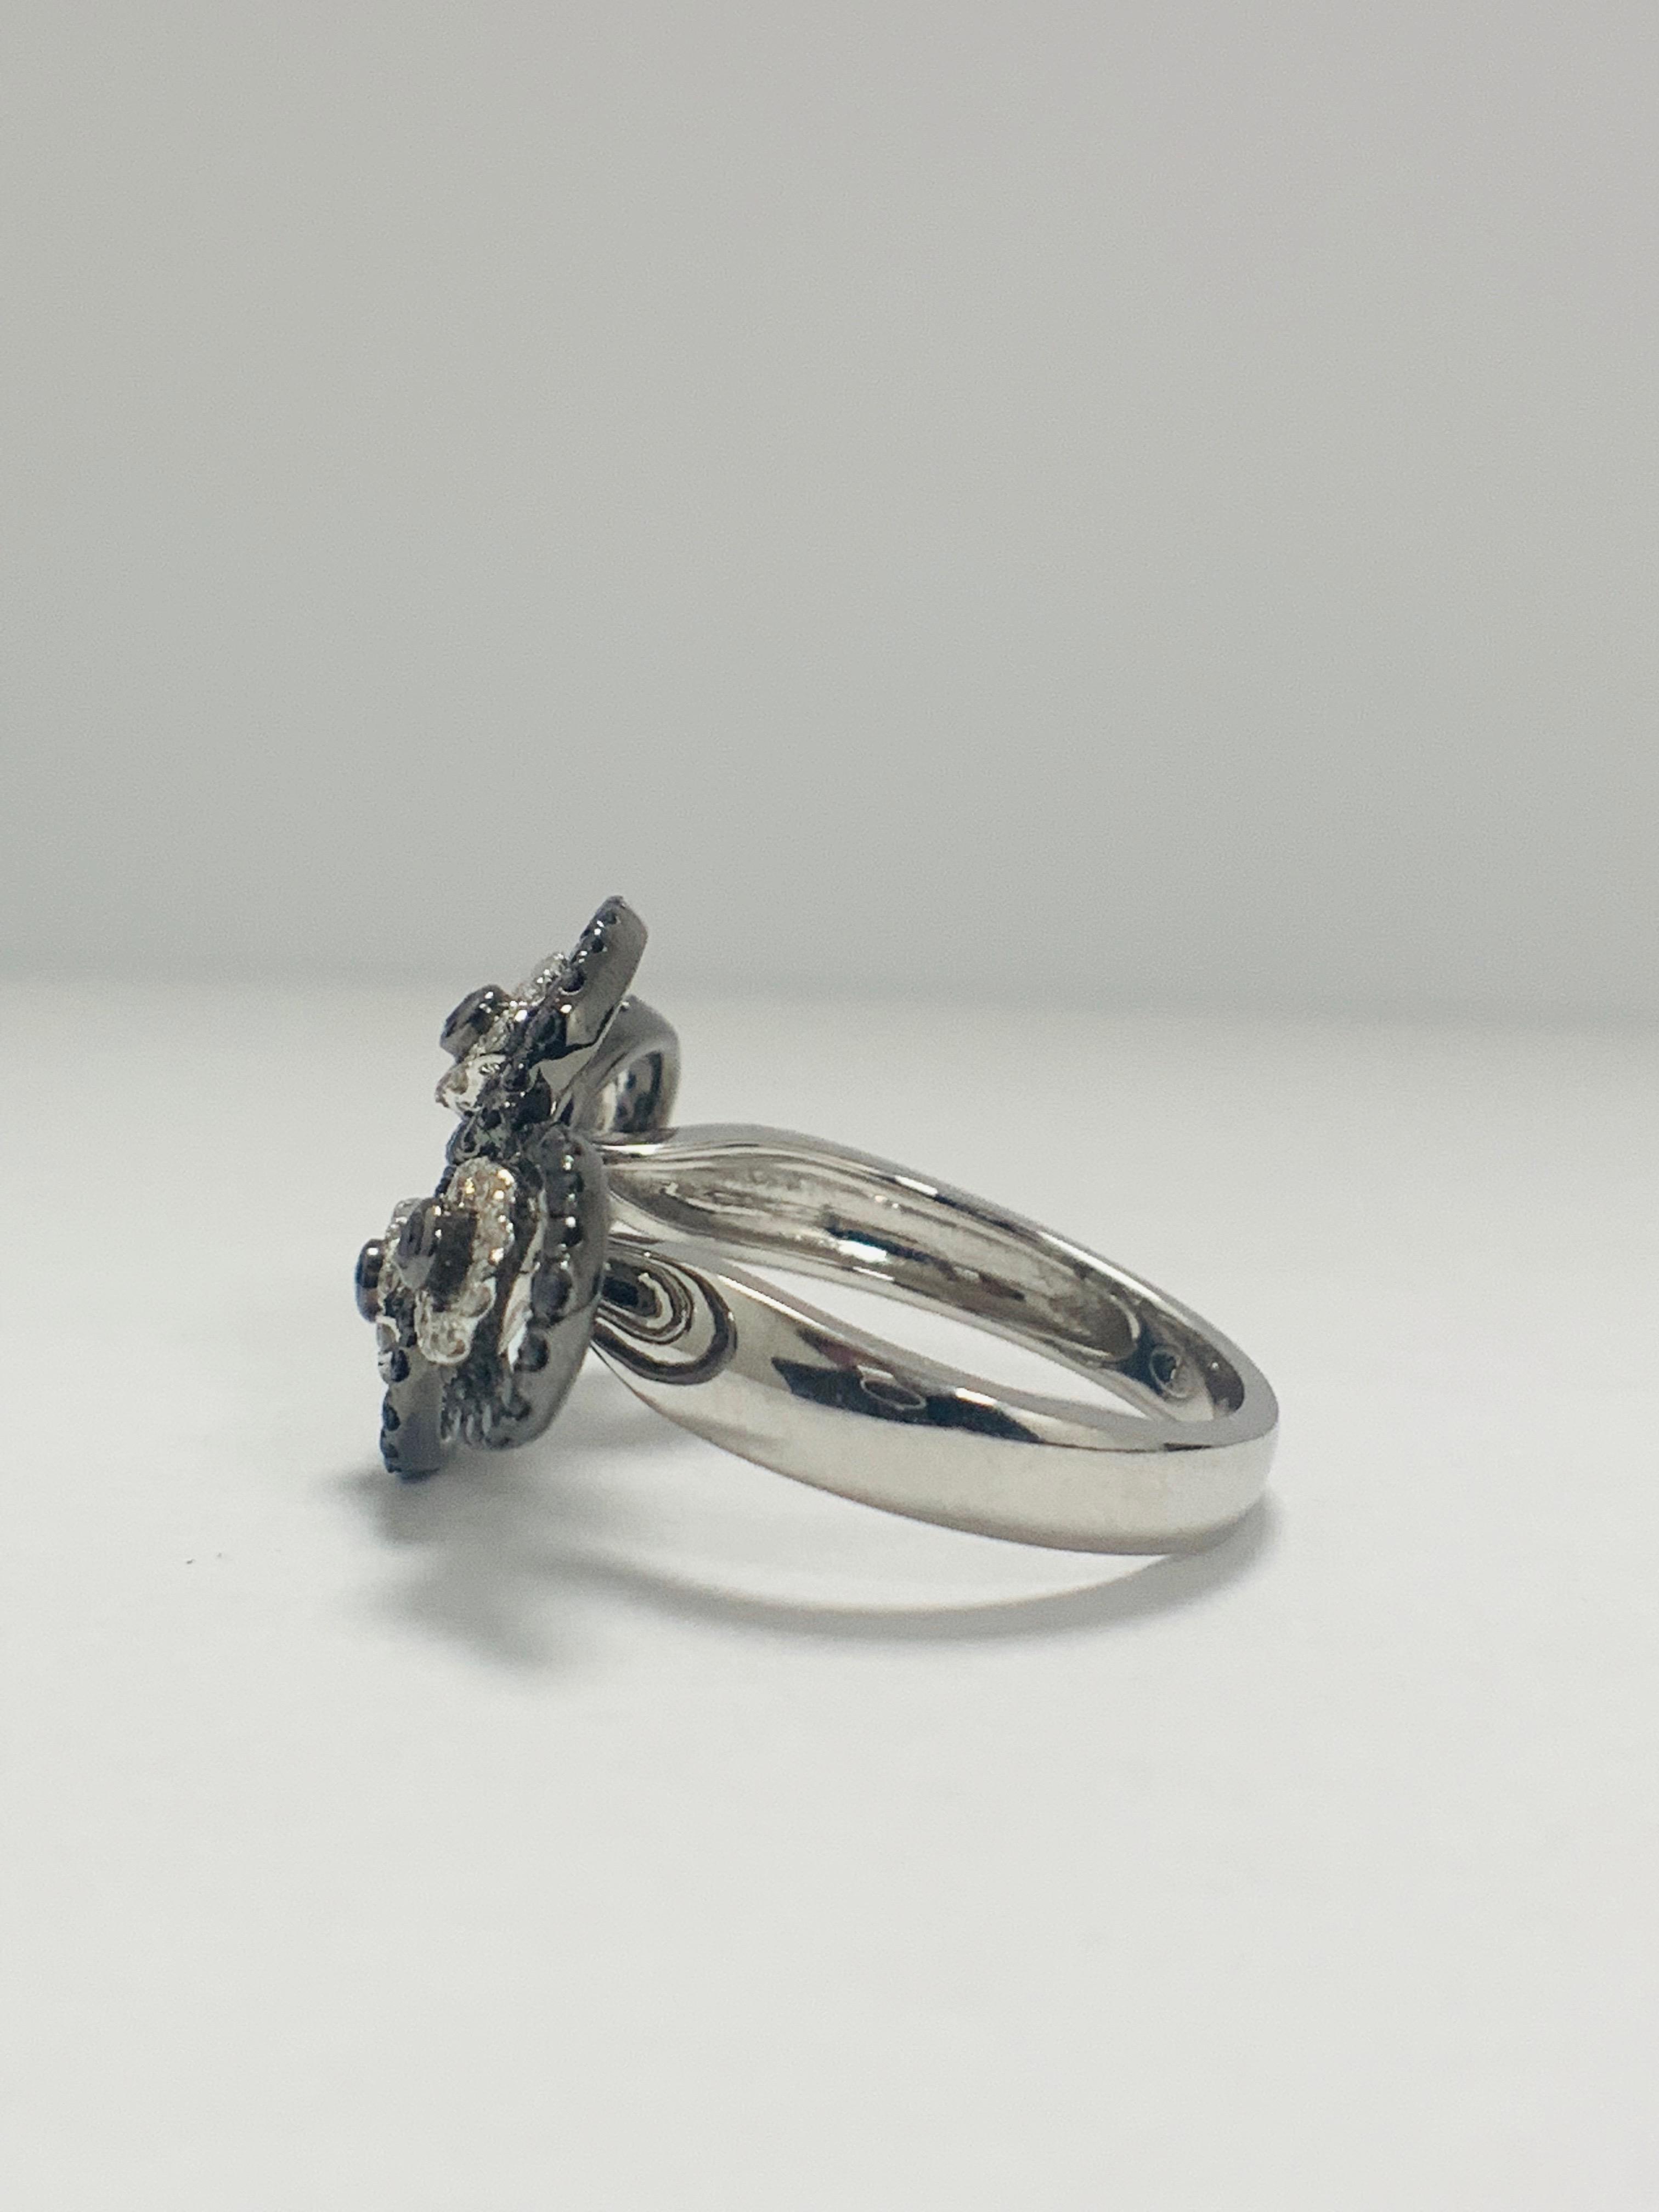 18ct White Gold Diamond ring featuring 80 round cut, black Diamonds (0.61ct TBDW) - Image 3 of 12